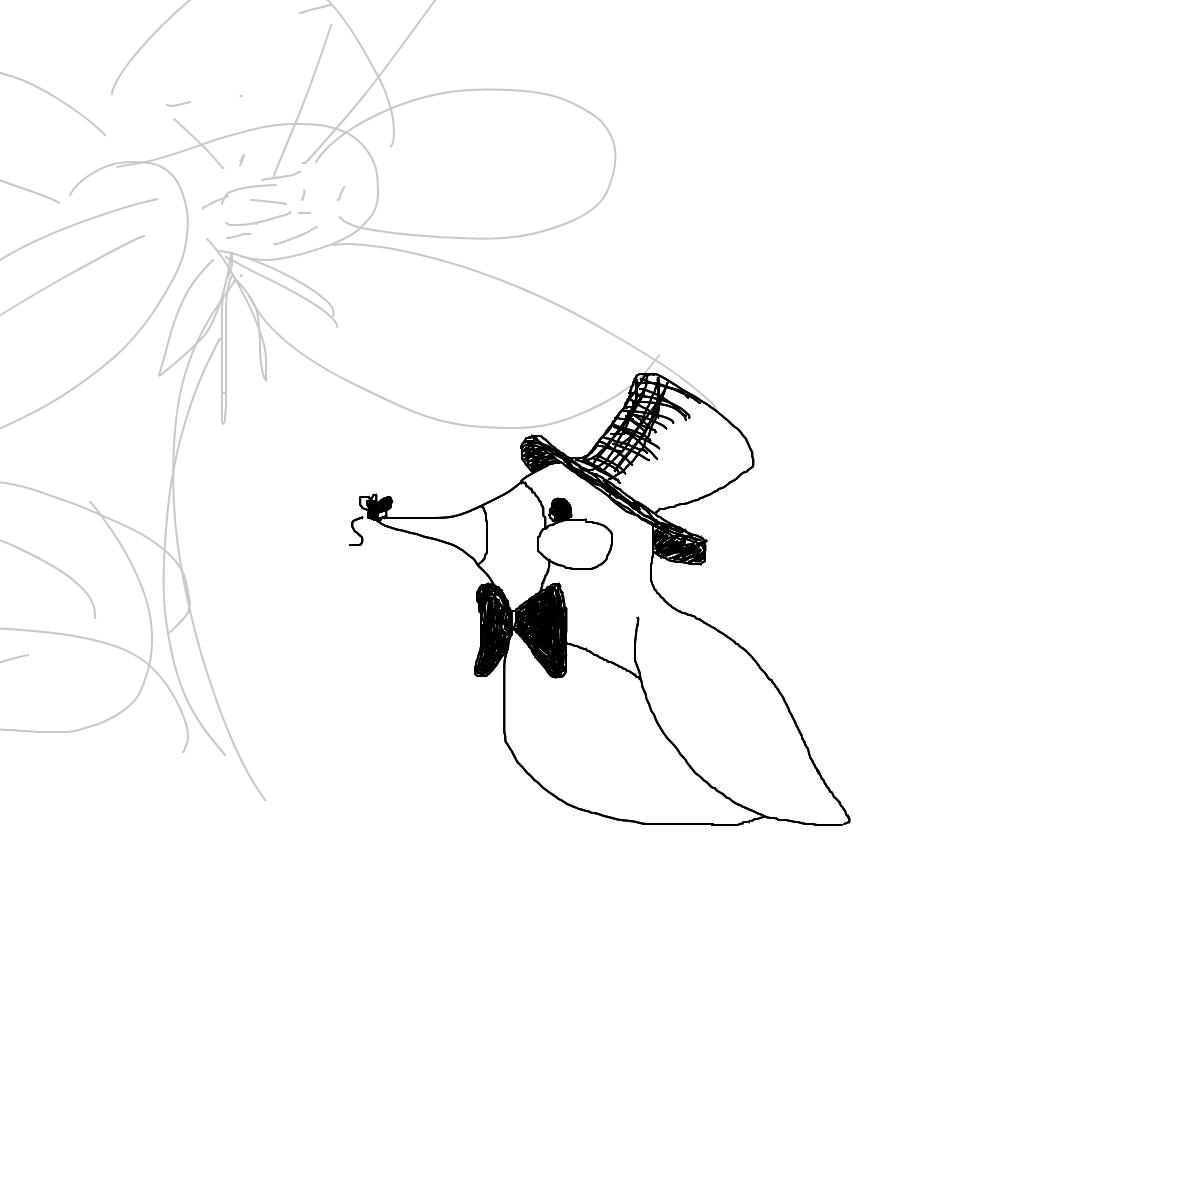 BAAAM drawing#24230 lat:50.0952949523925800lng: 14.7216844558715820